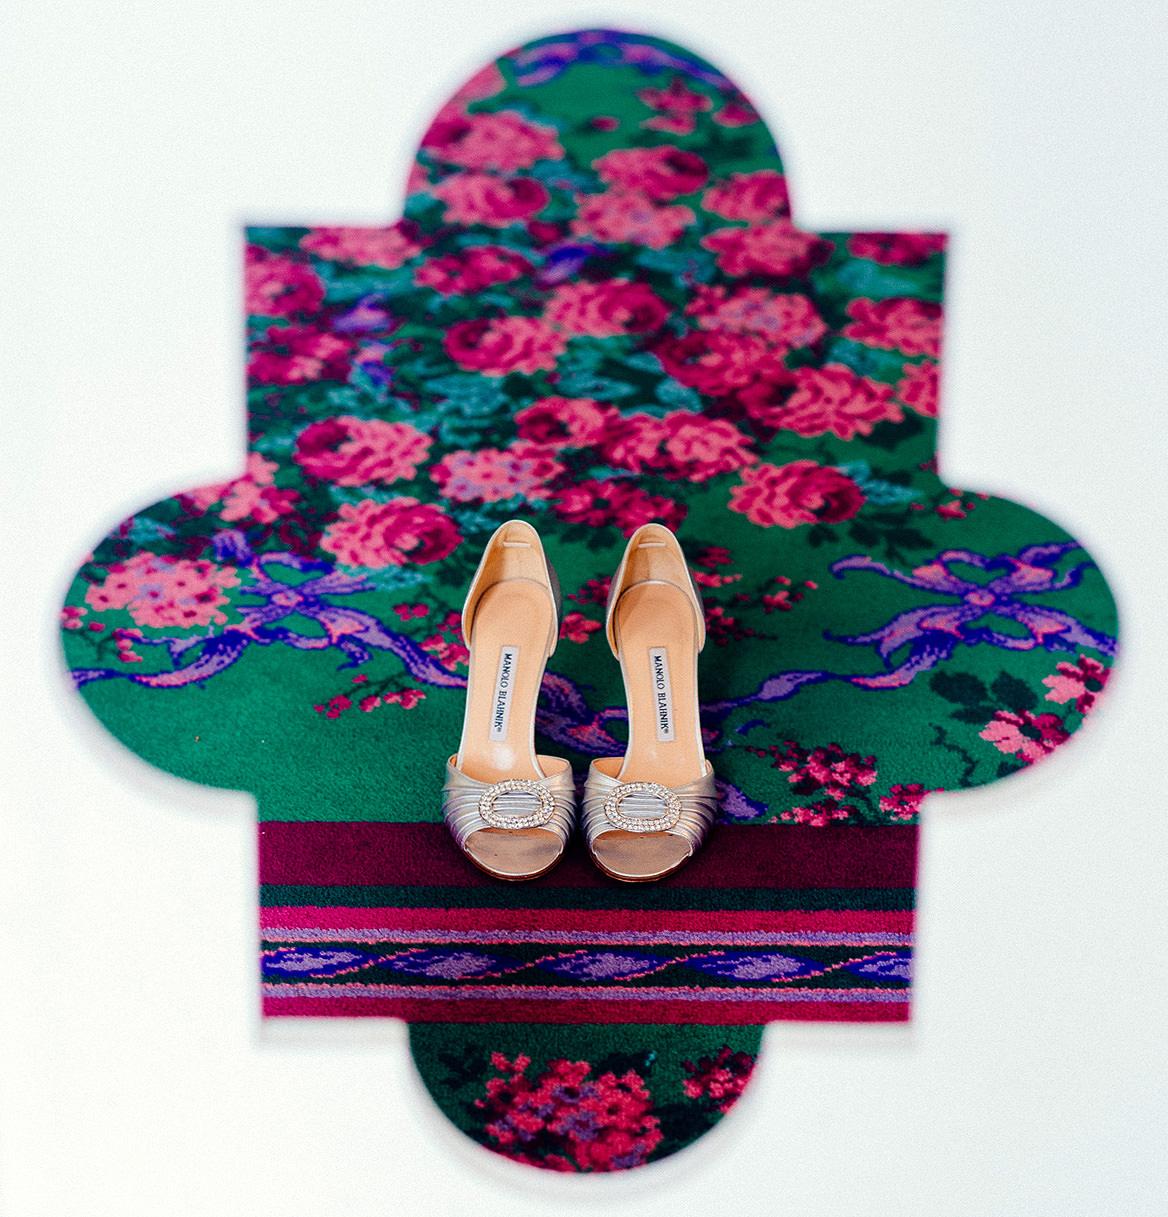 creative wedding detail brides shoes at greenbrier resort